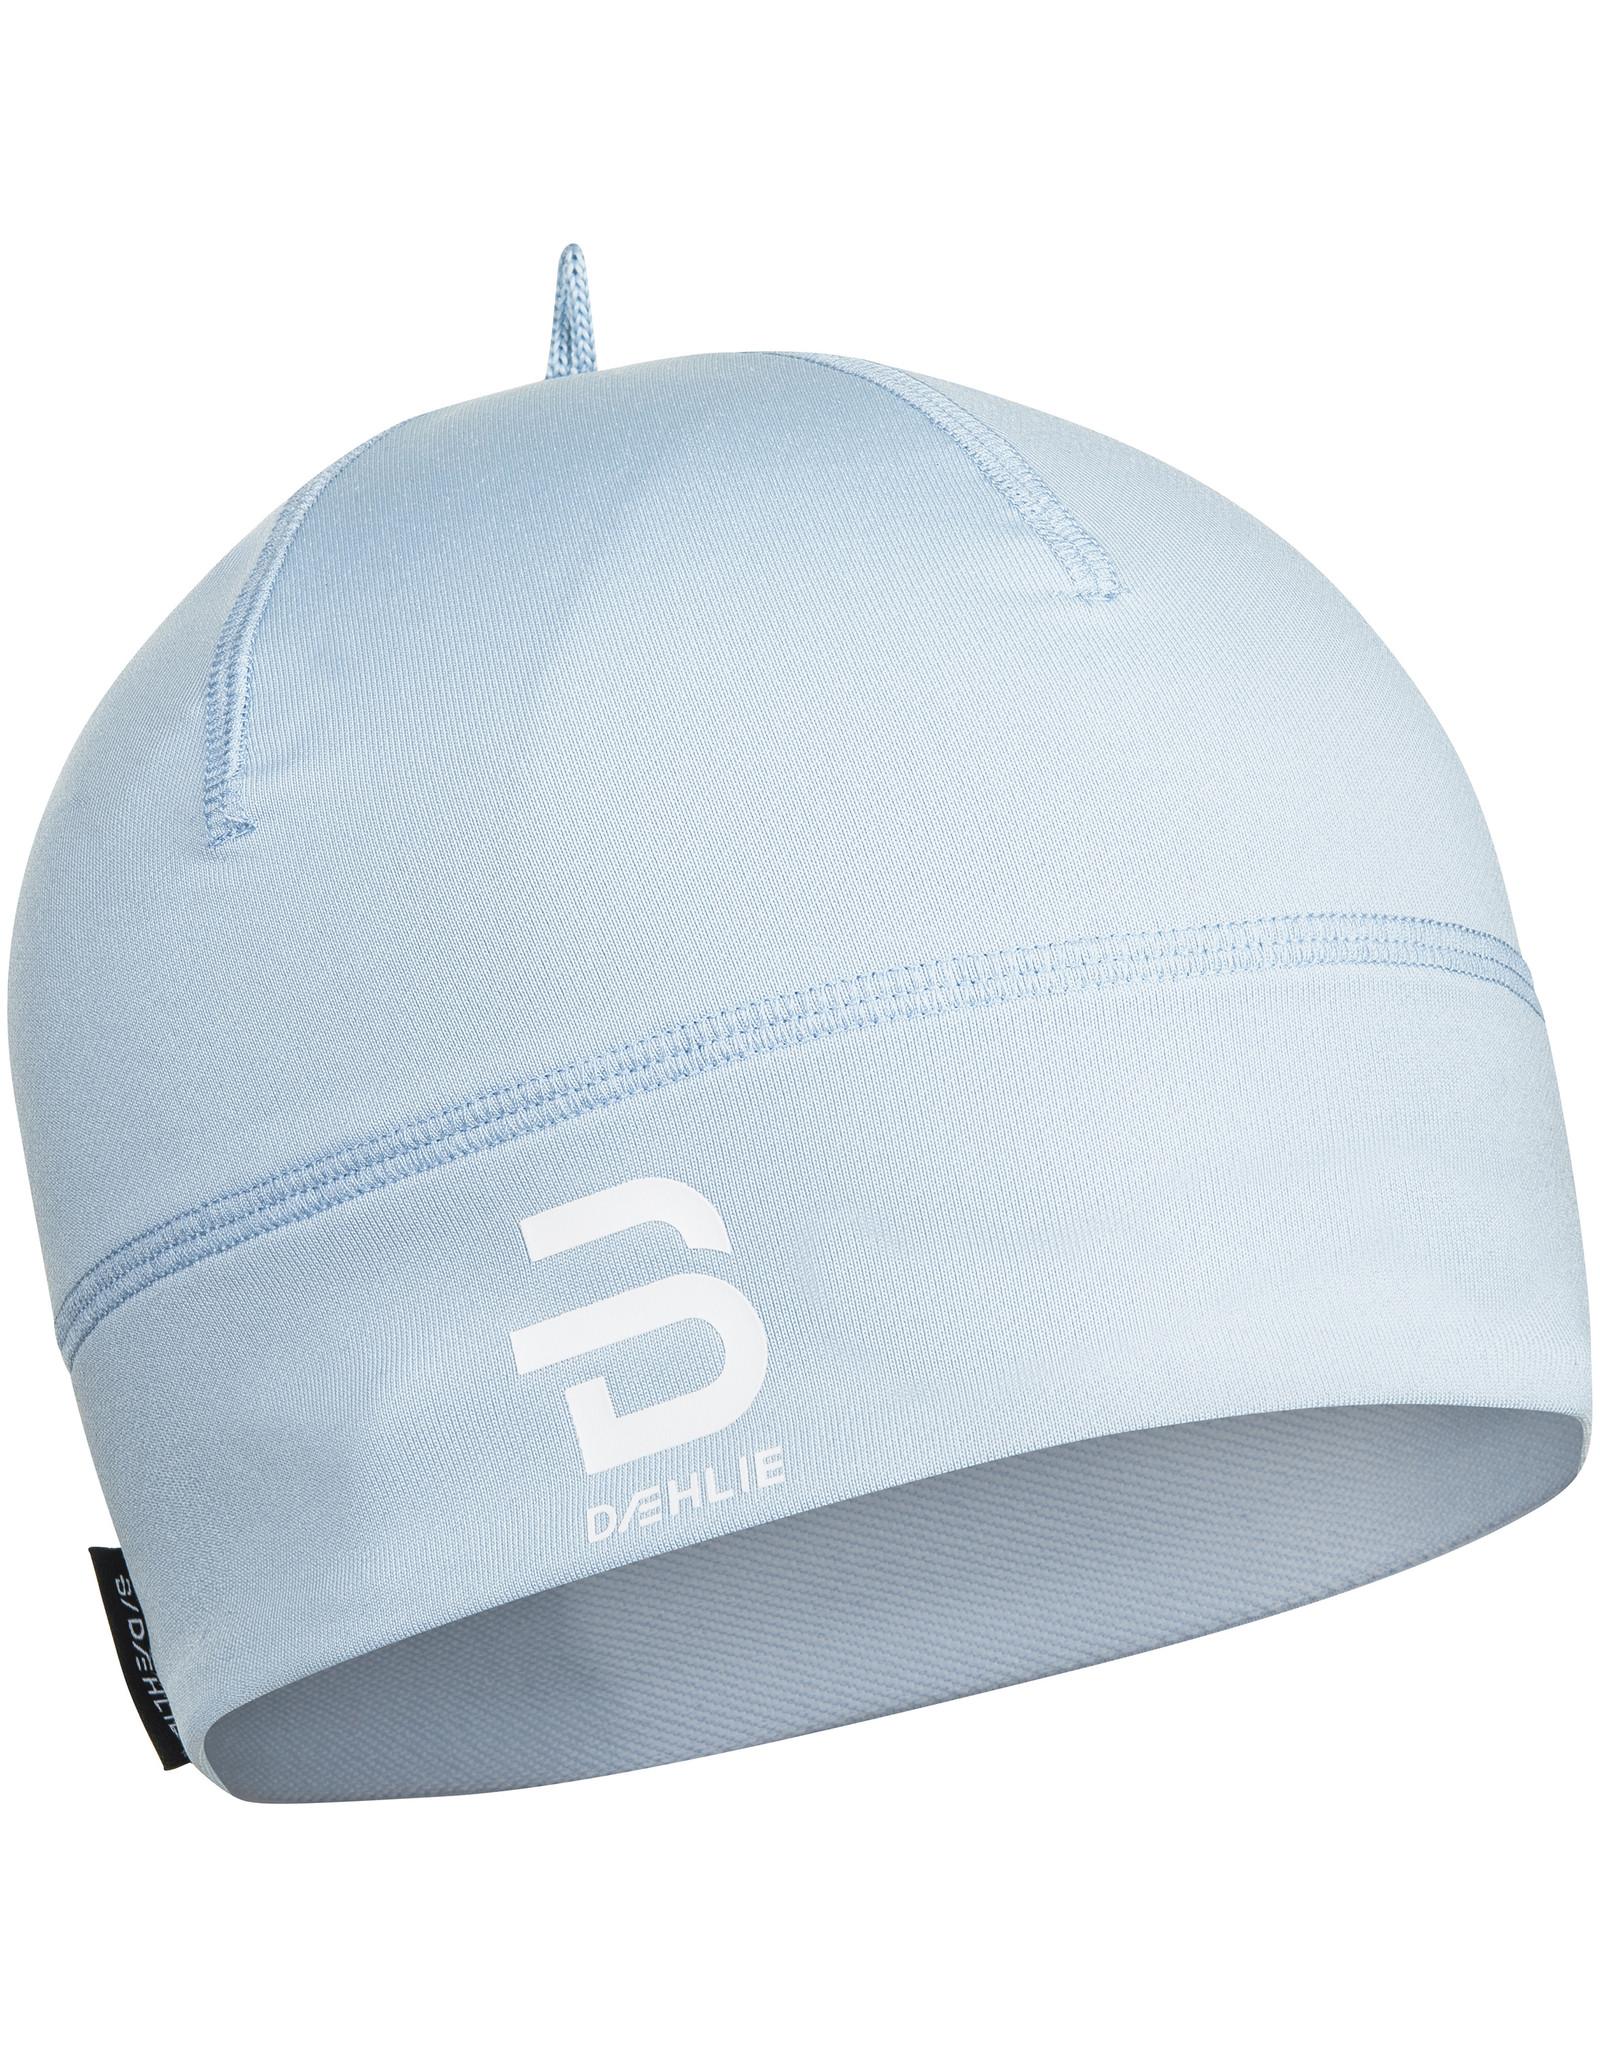 Bjorn Daehlie Polyknit Hat Cashmere Blue